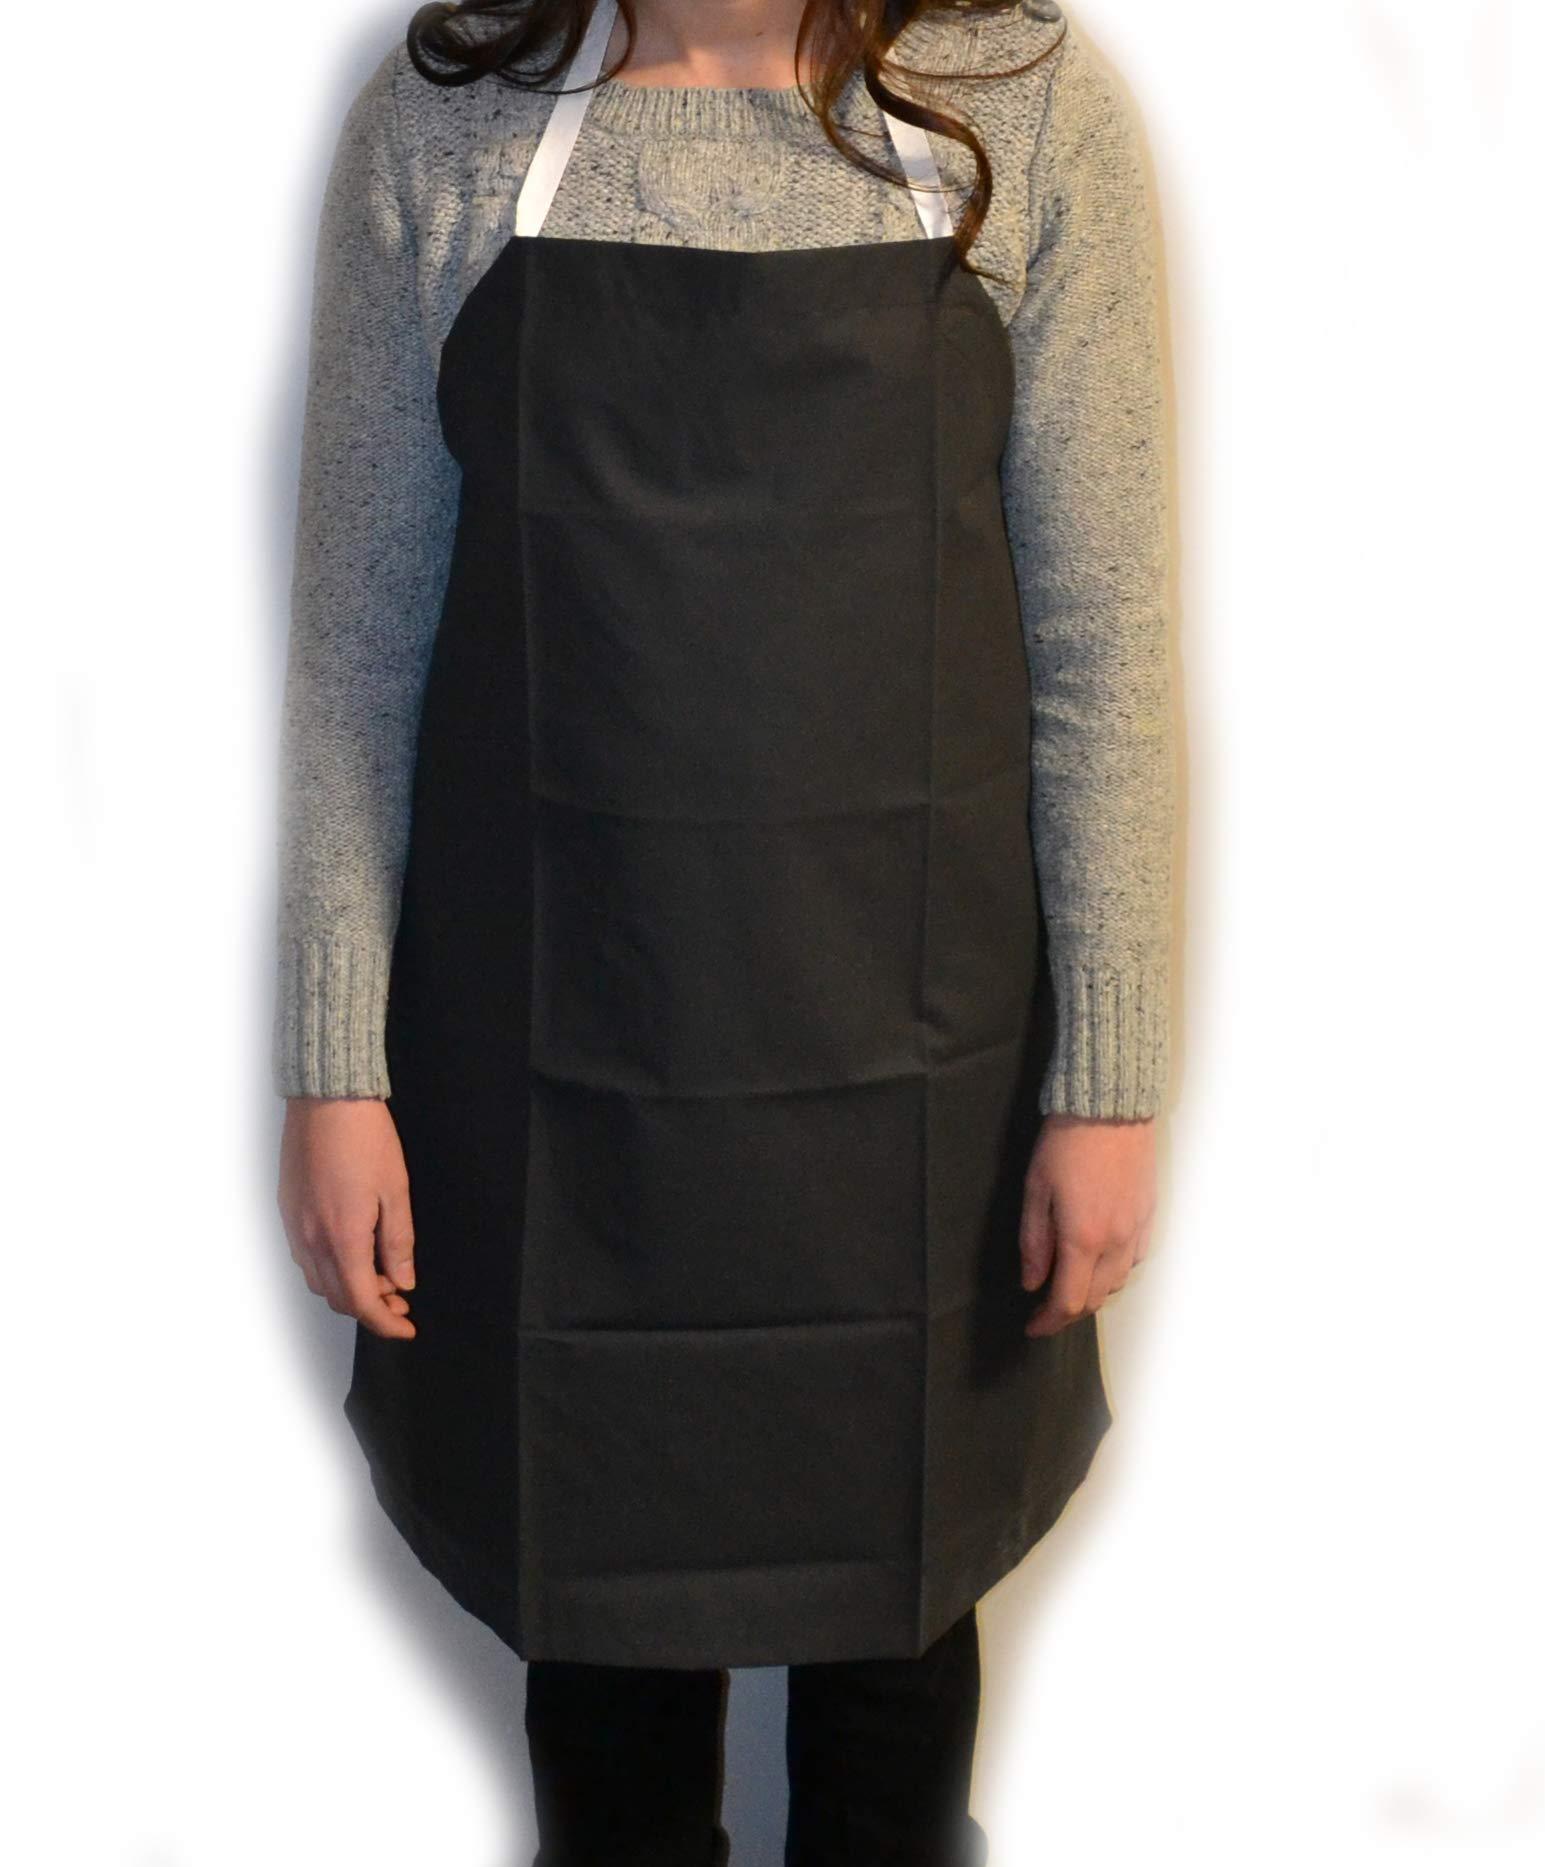 Eisco Labs Black Rubber Coated Cloth Bib Apron, Large (27''W x 42''L)